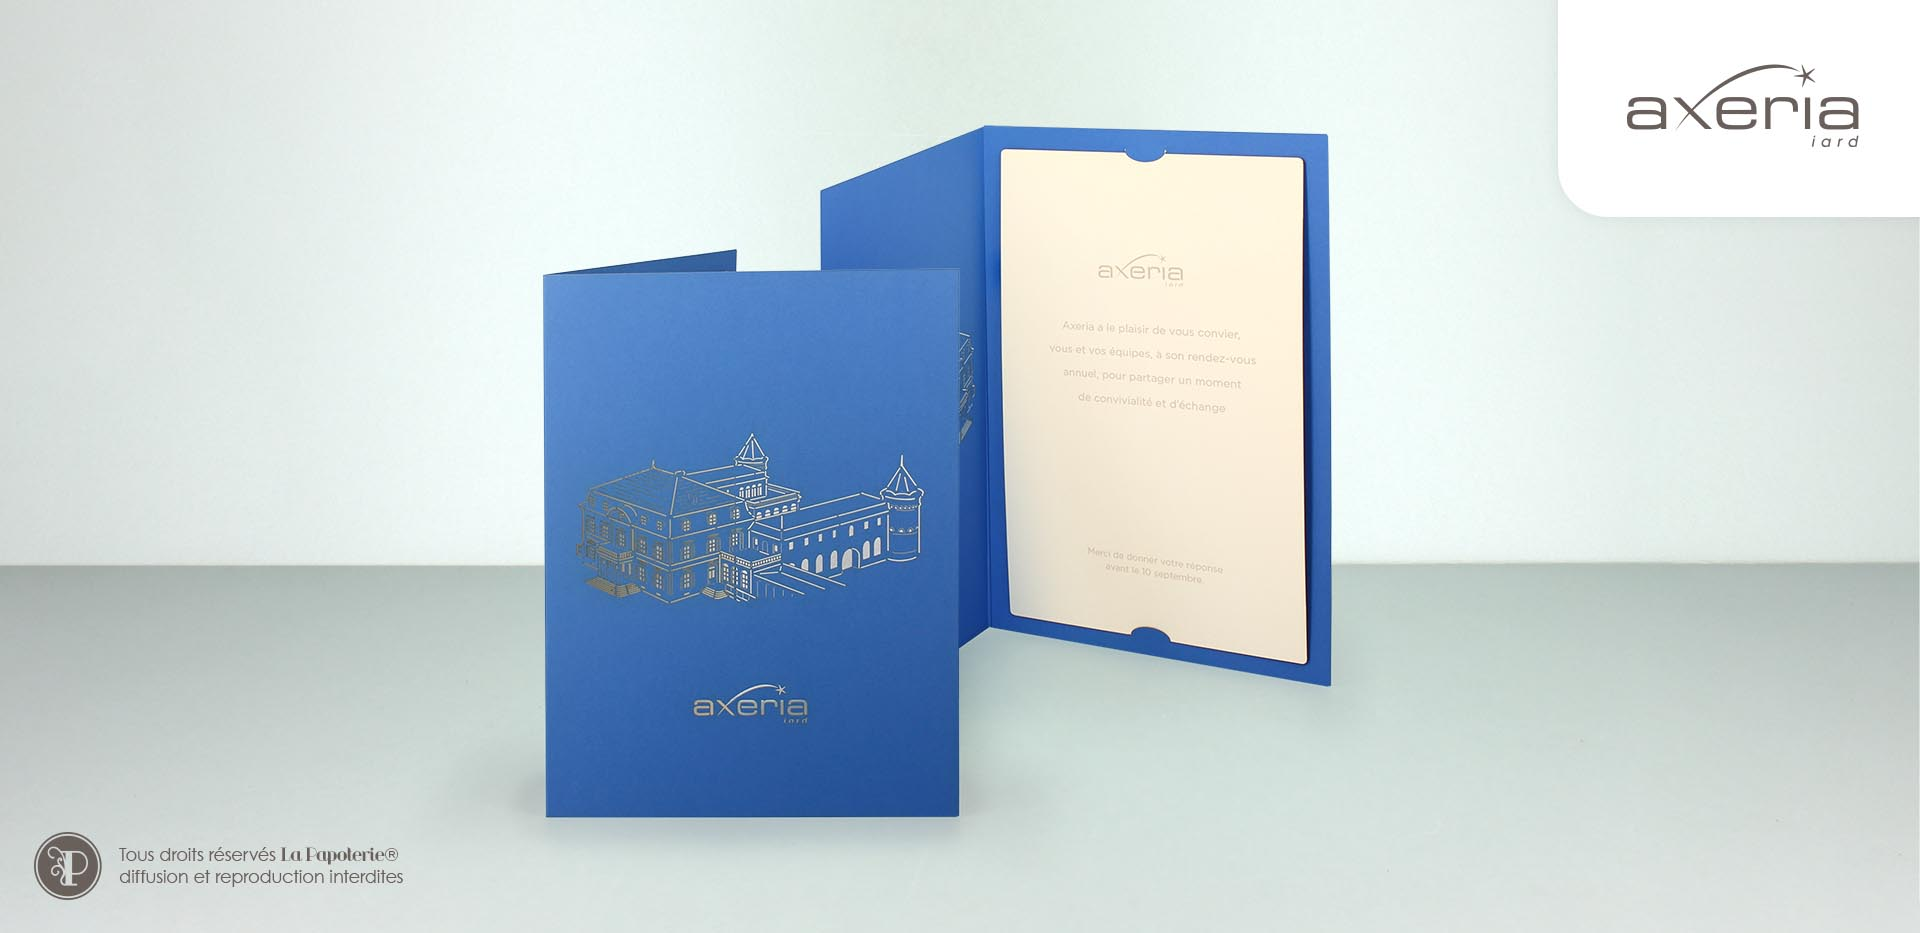 La Papoterie axeria-montcelard-invitation Carte A5 Axeria montcelard